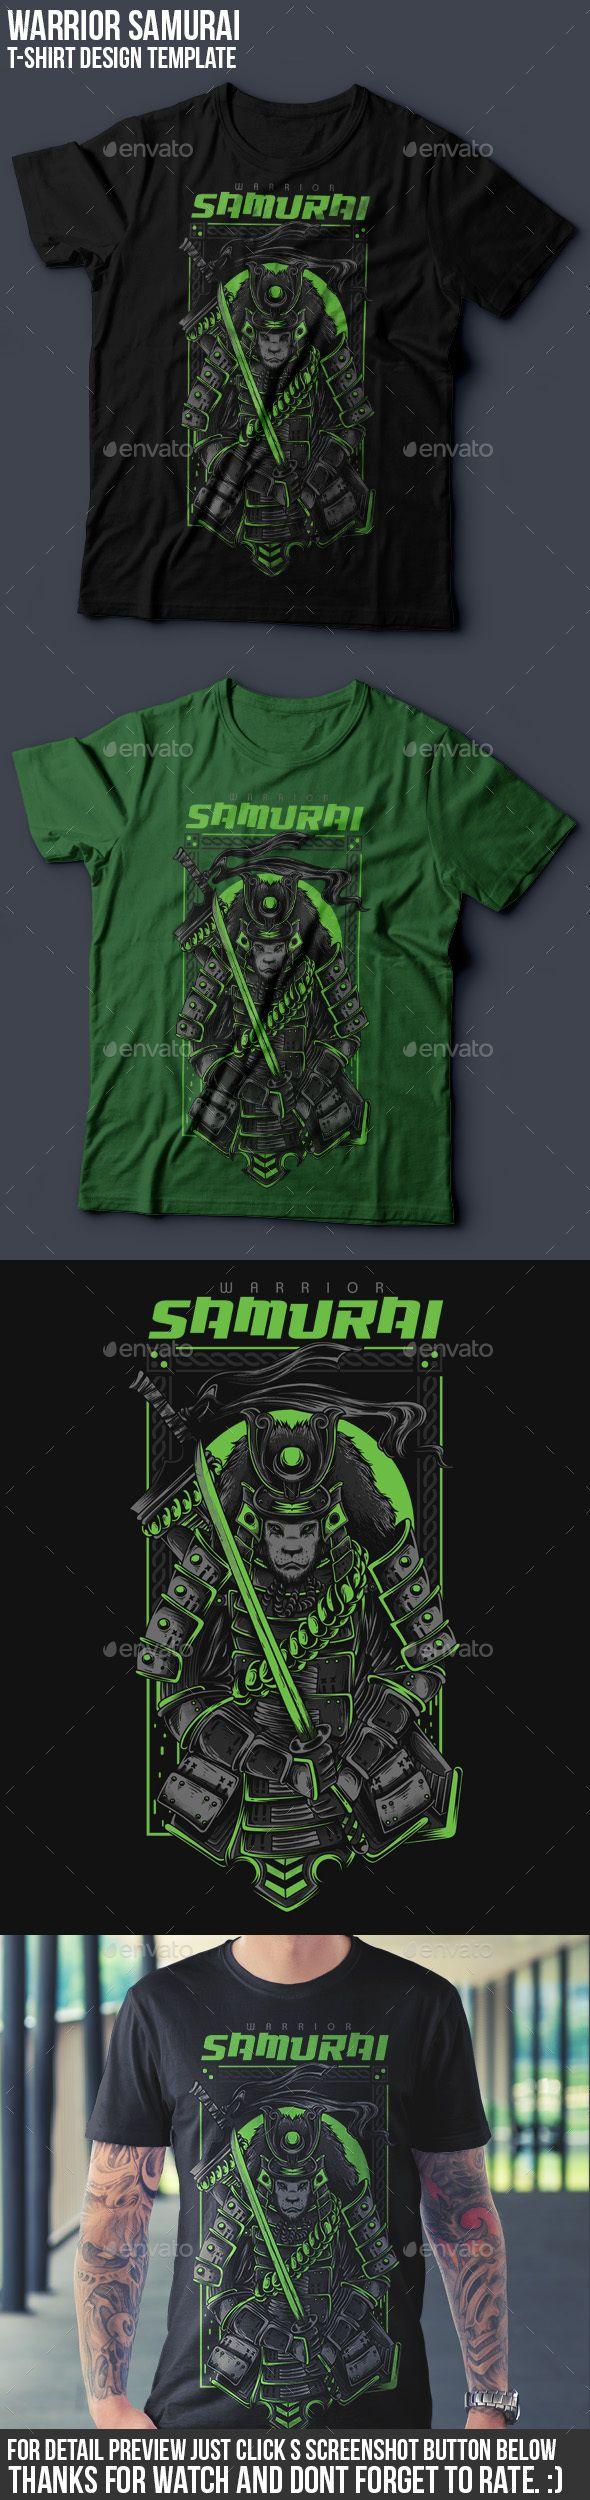 Black t shirt vector ai - Samurai Warrior T Shirt Design